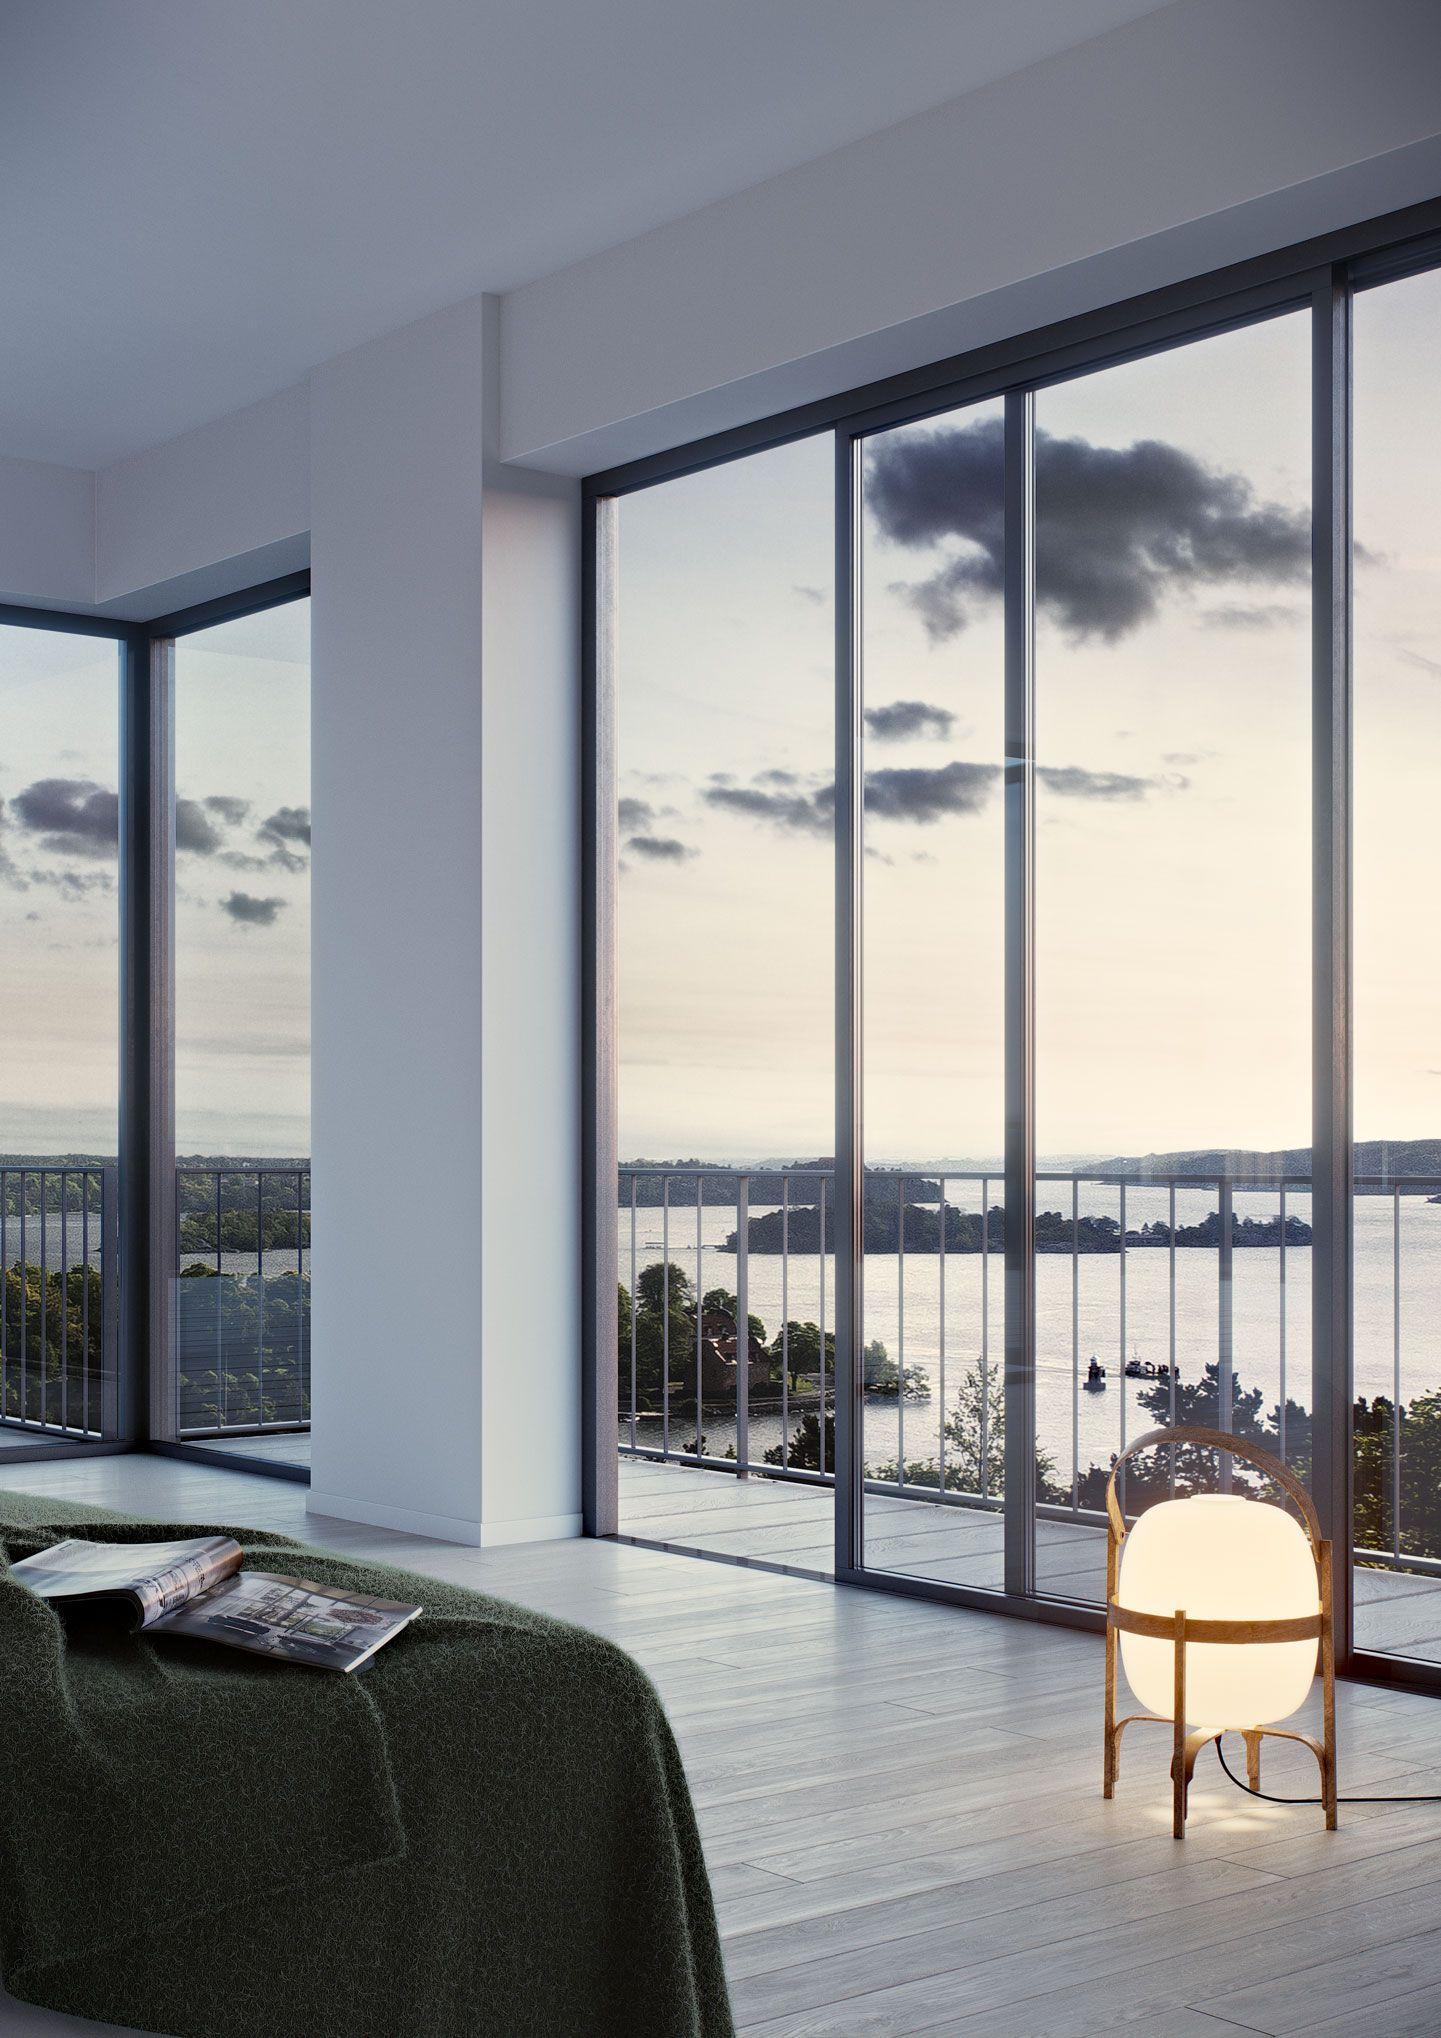 Oscarproperties oscar properties stockholm interior for Room with no doors or windows